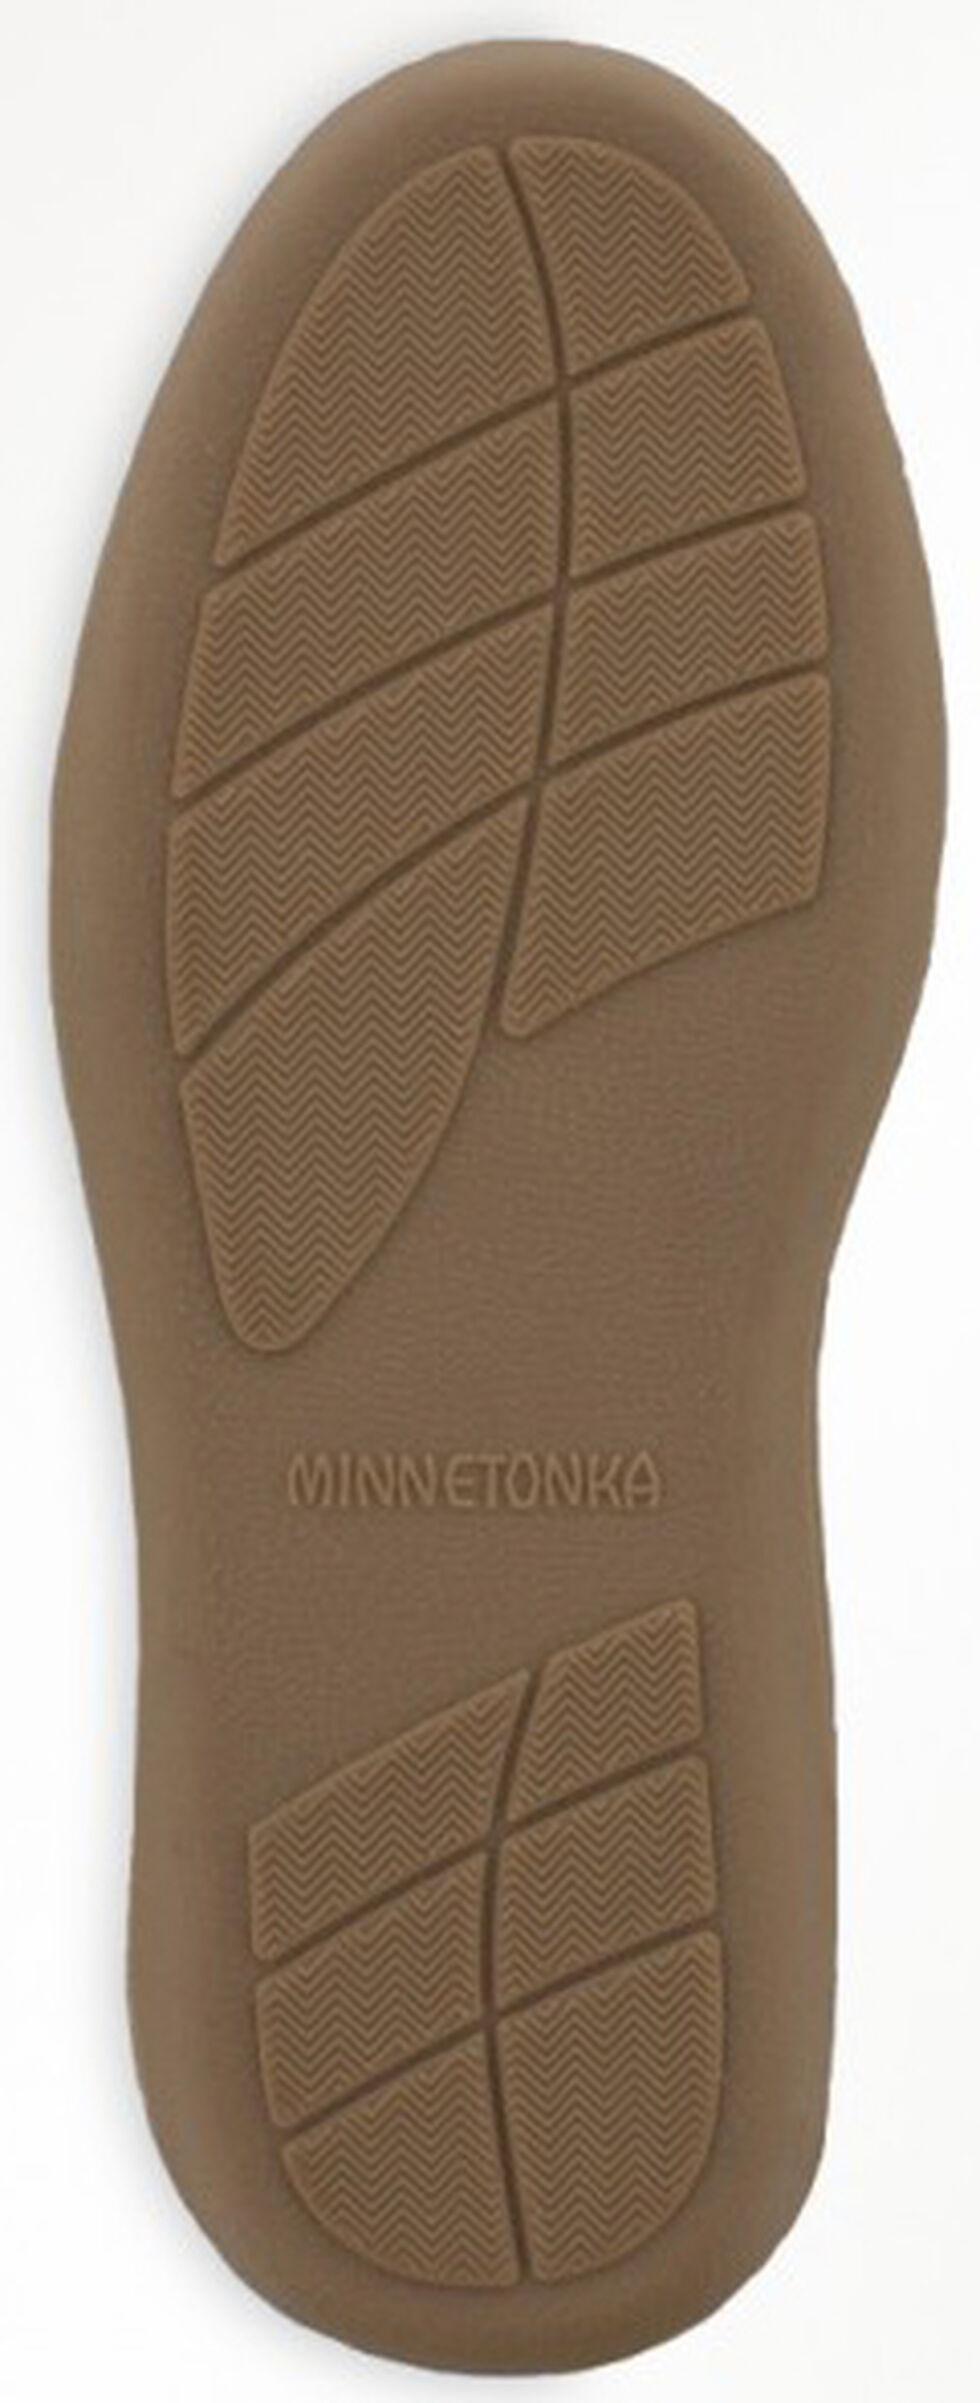 Minnetonka Women's Sheepskin Hardsole Moccasins, Tan, hi-res